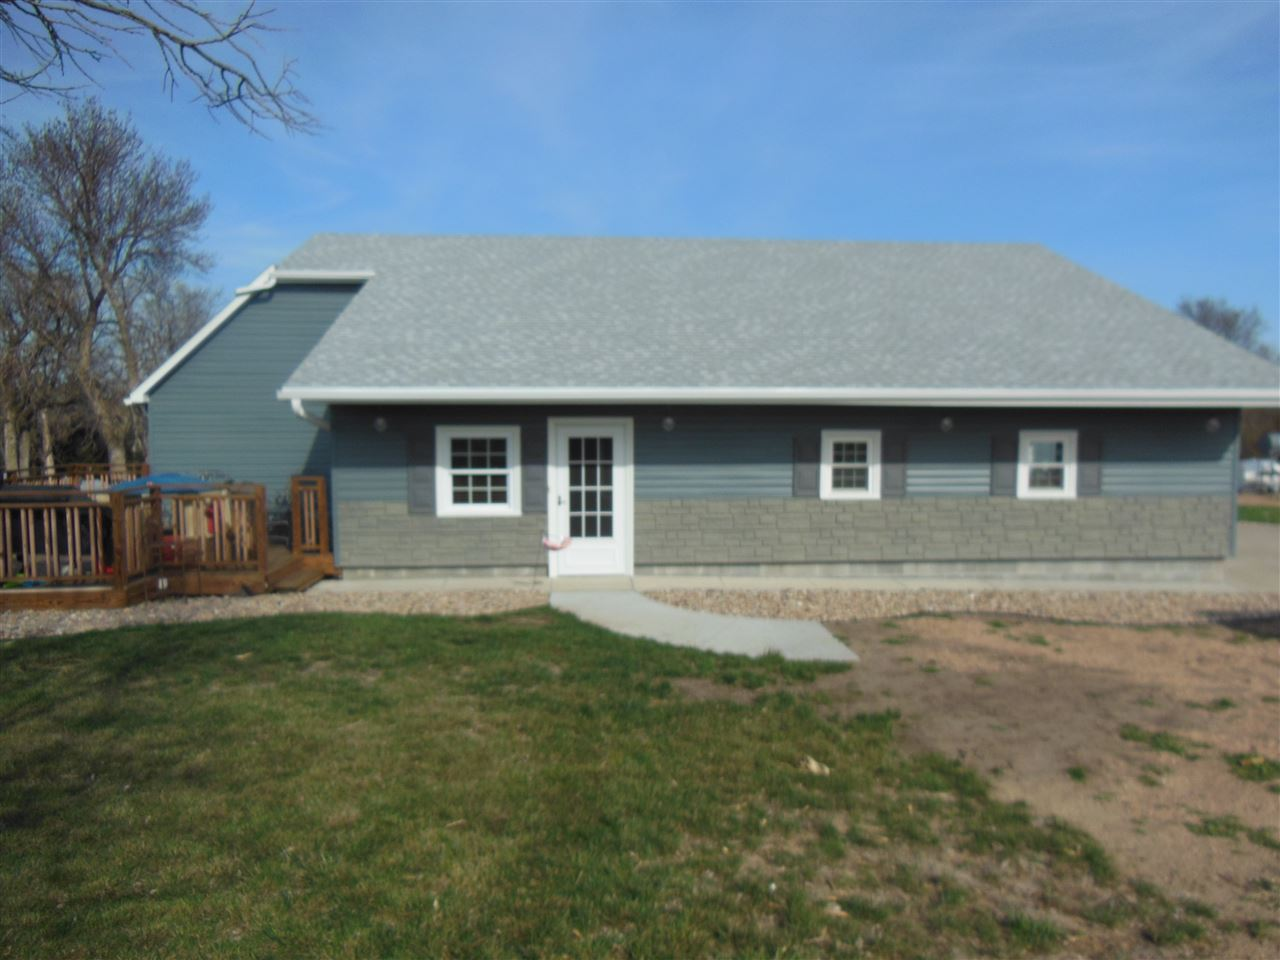 Real Estate for Sale, ListingId: 32799554, Ayr,NE68925